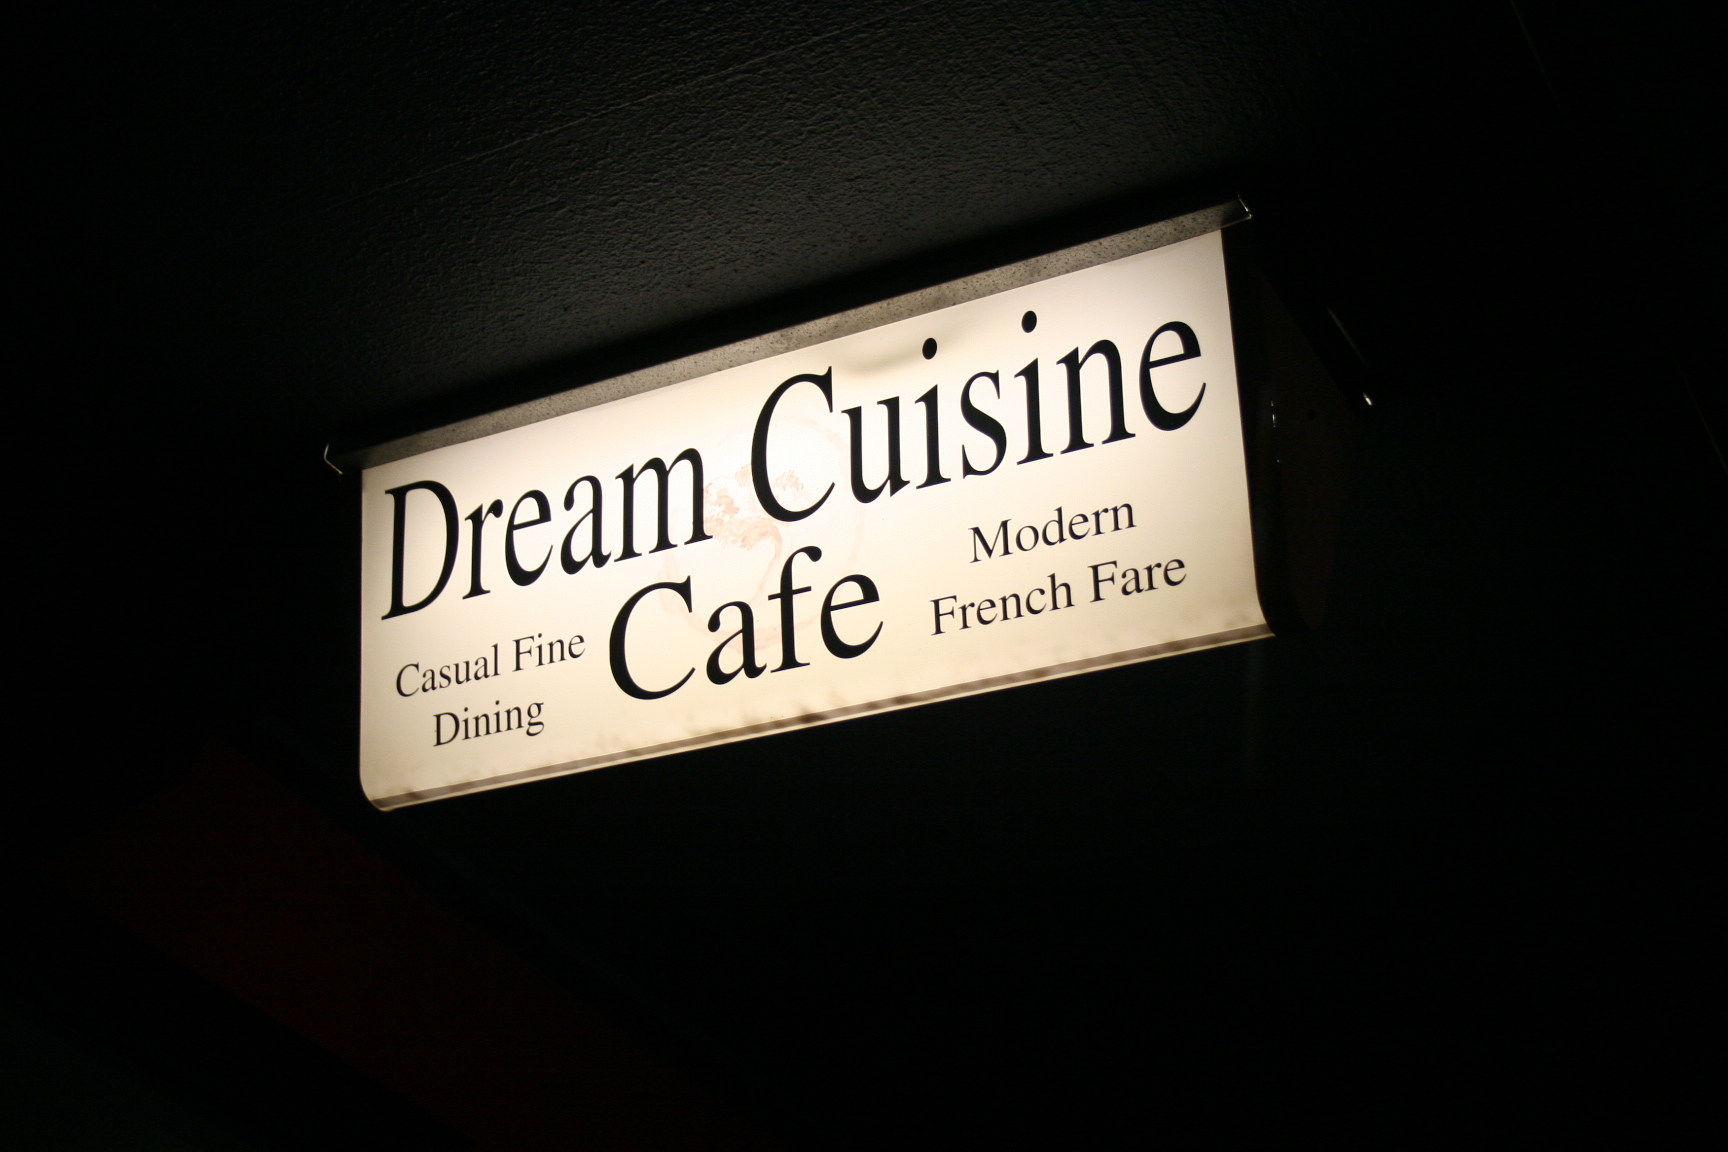 Dream Cuisine Cafe Cherry Hill